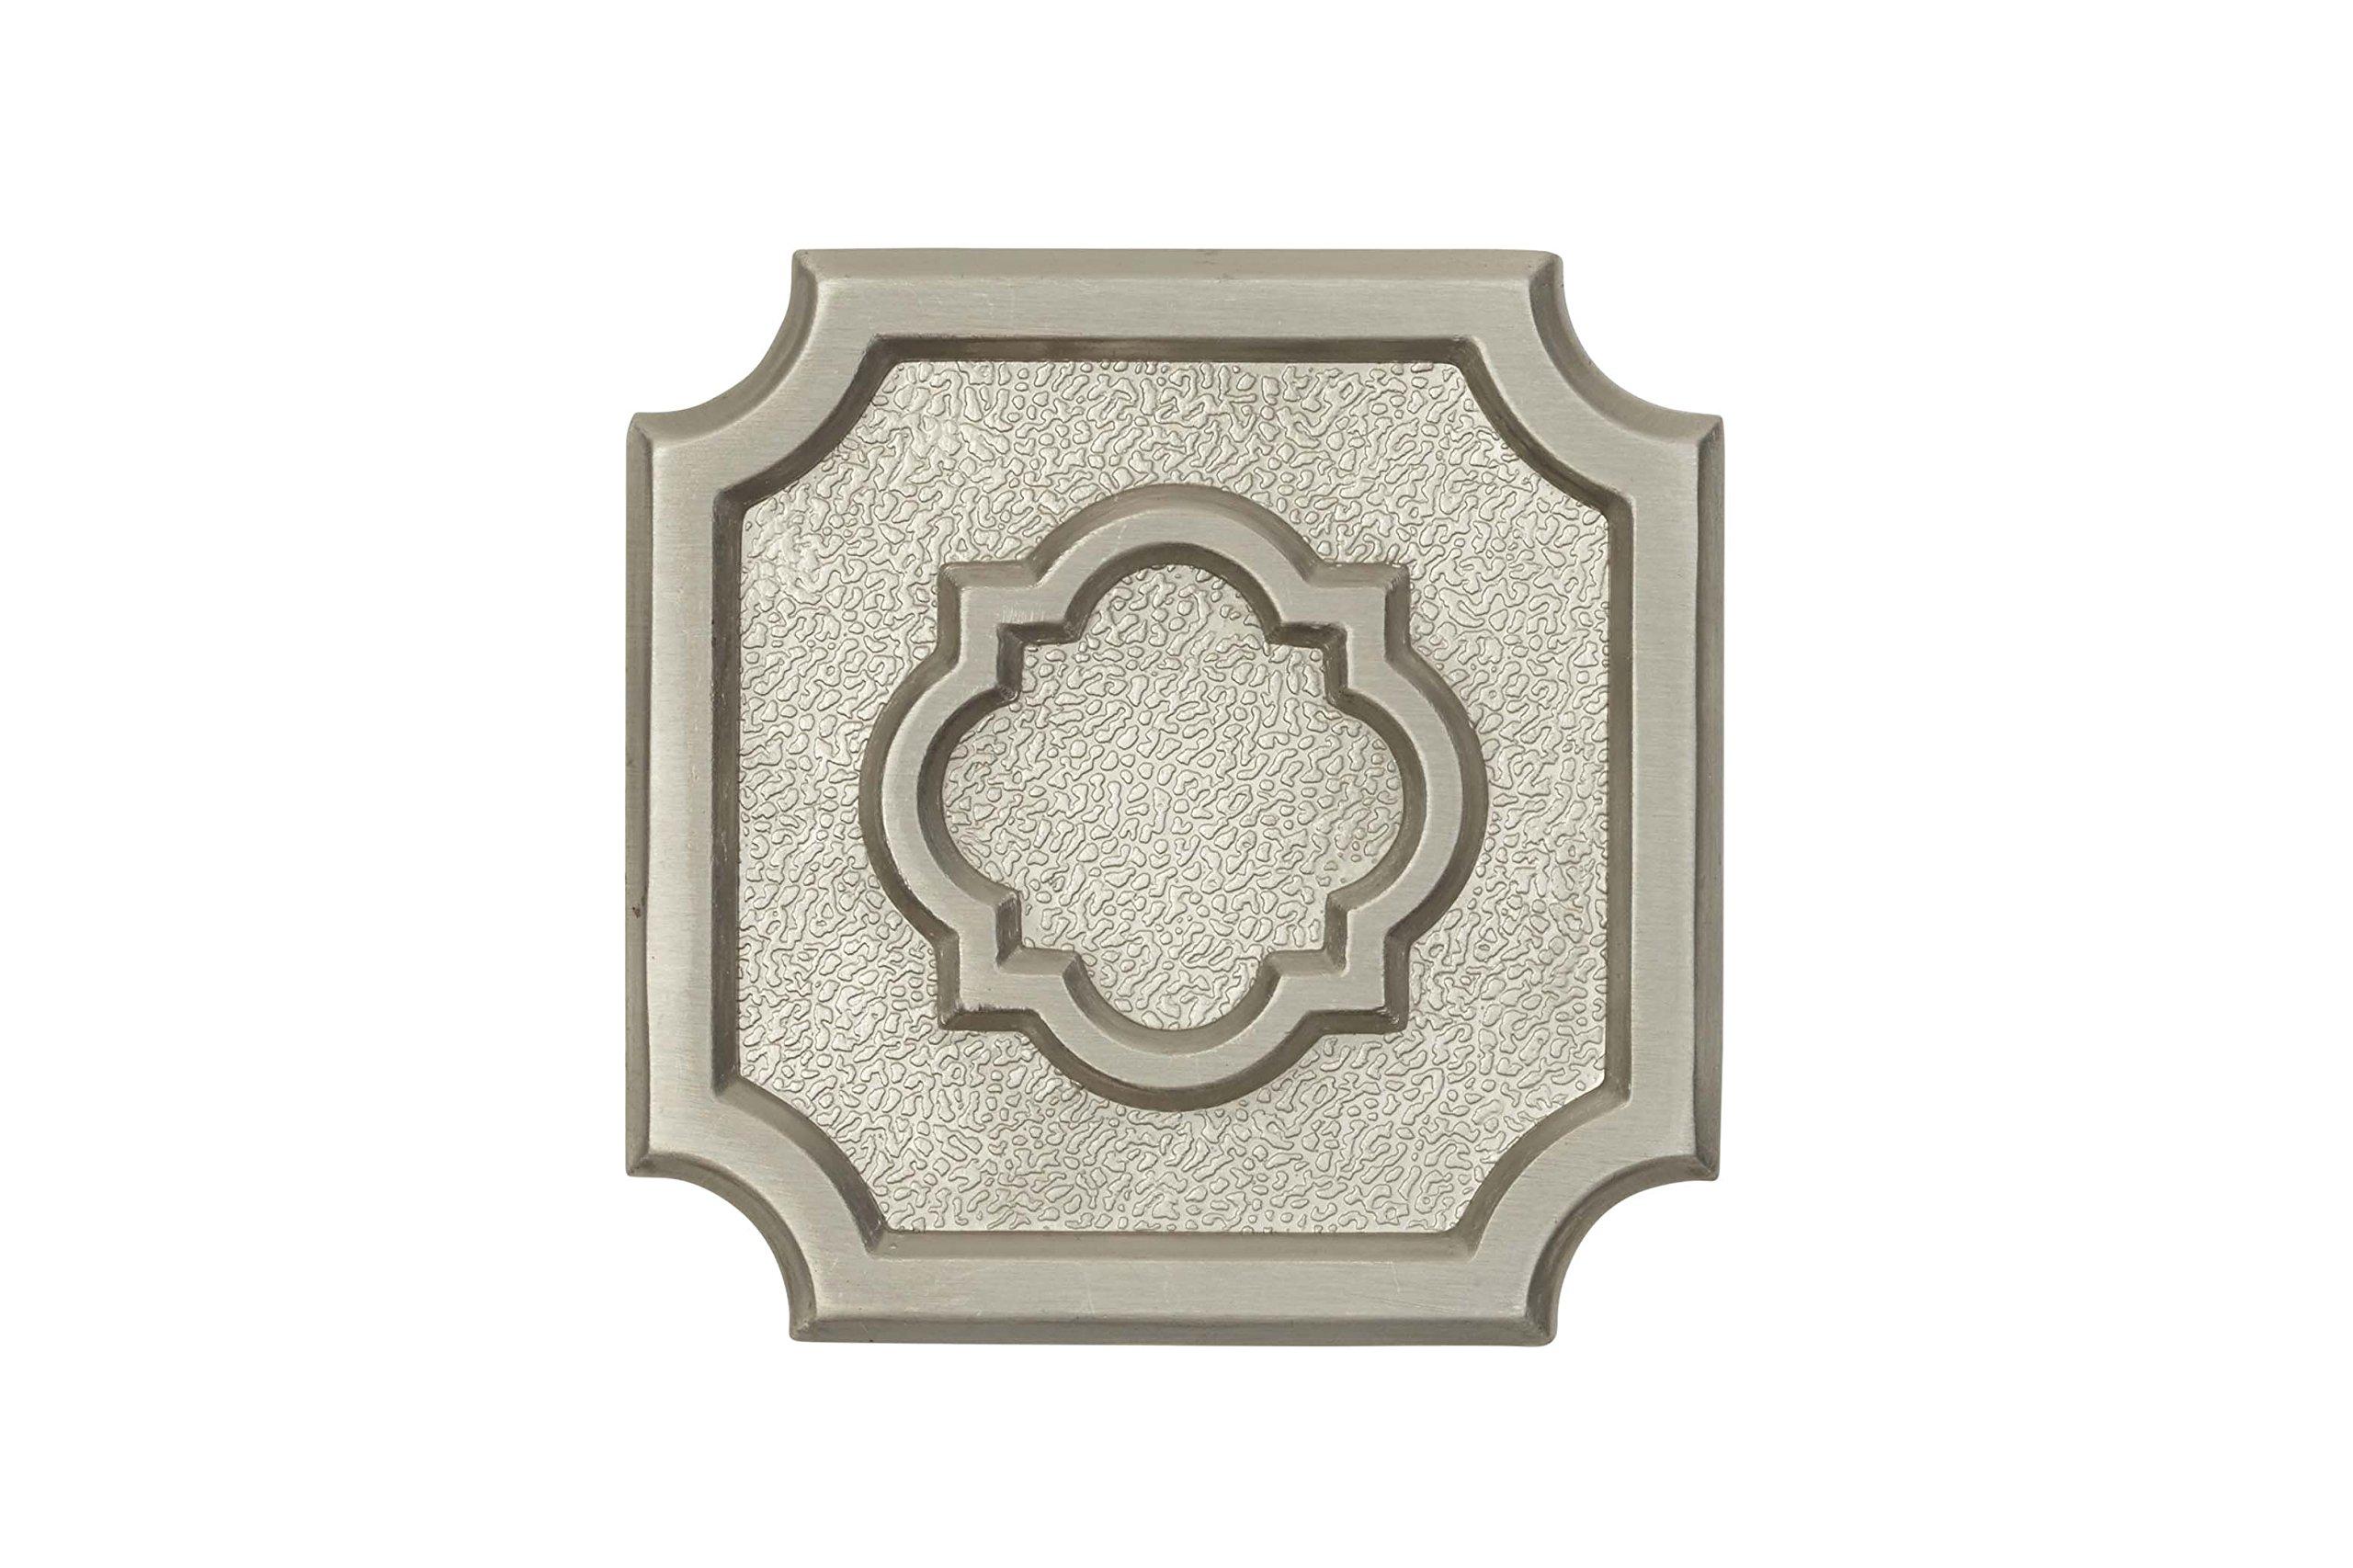 Architectural Mailboxes 3610SN Aluminum Satin Nickel Madrid Emblem